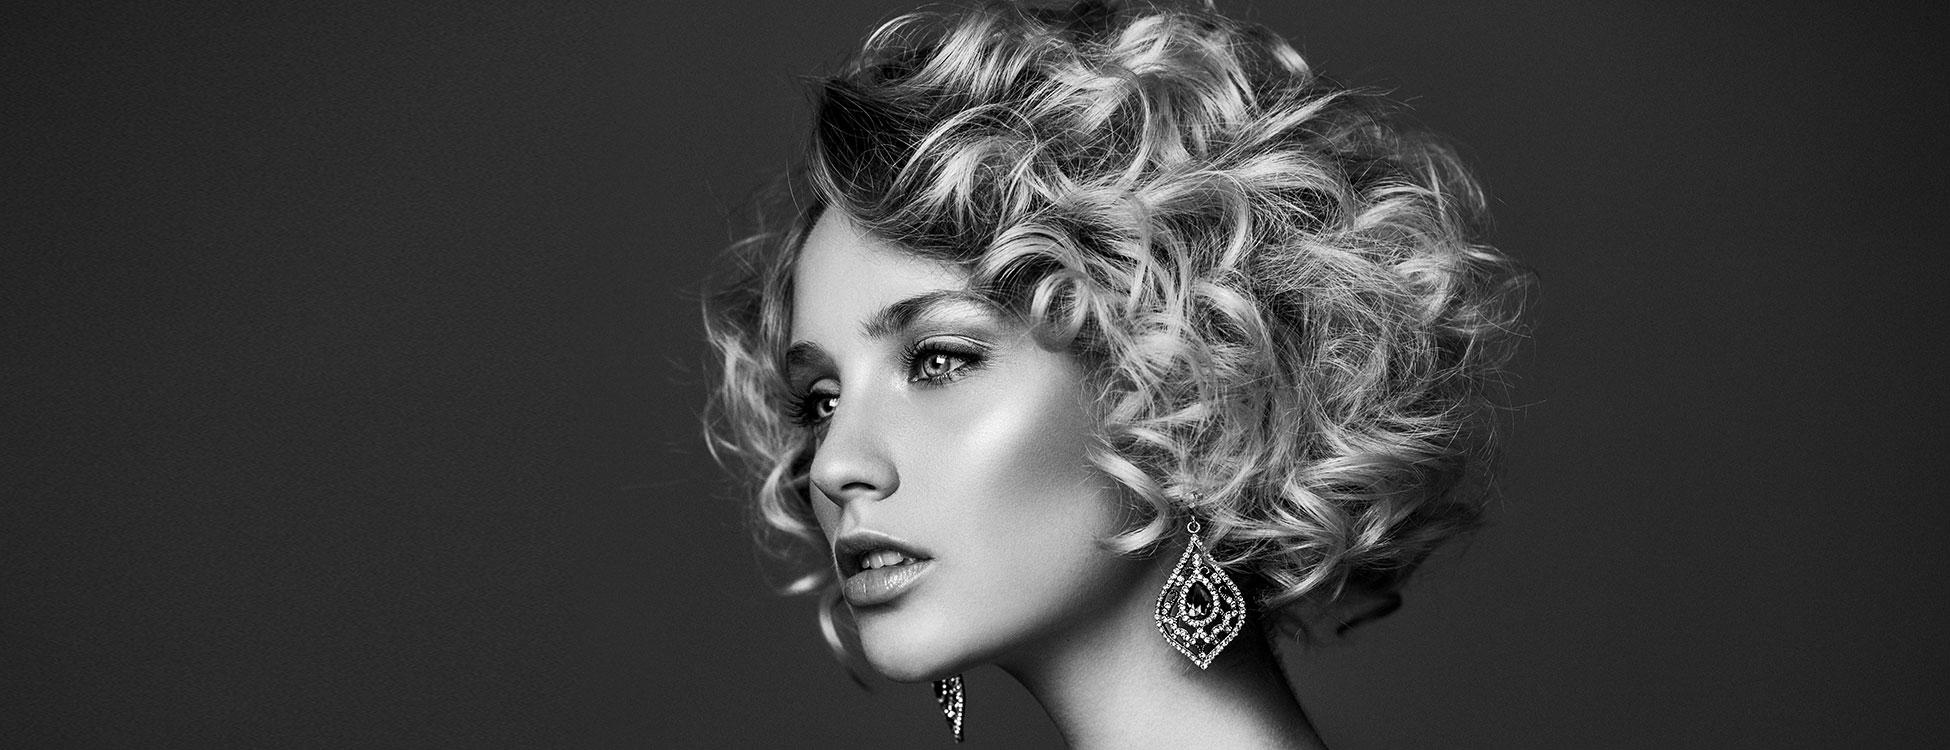 Domain Spa & Salon - Elkton Hair Salon